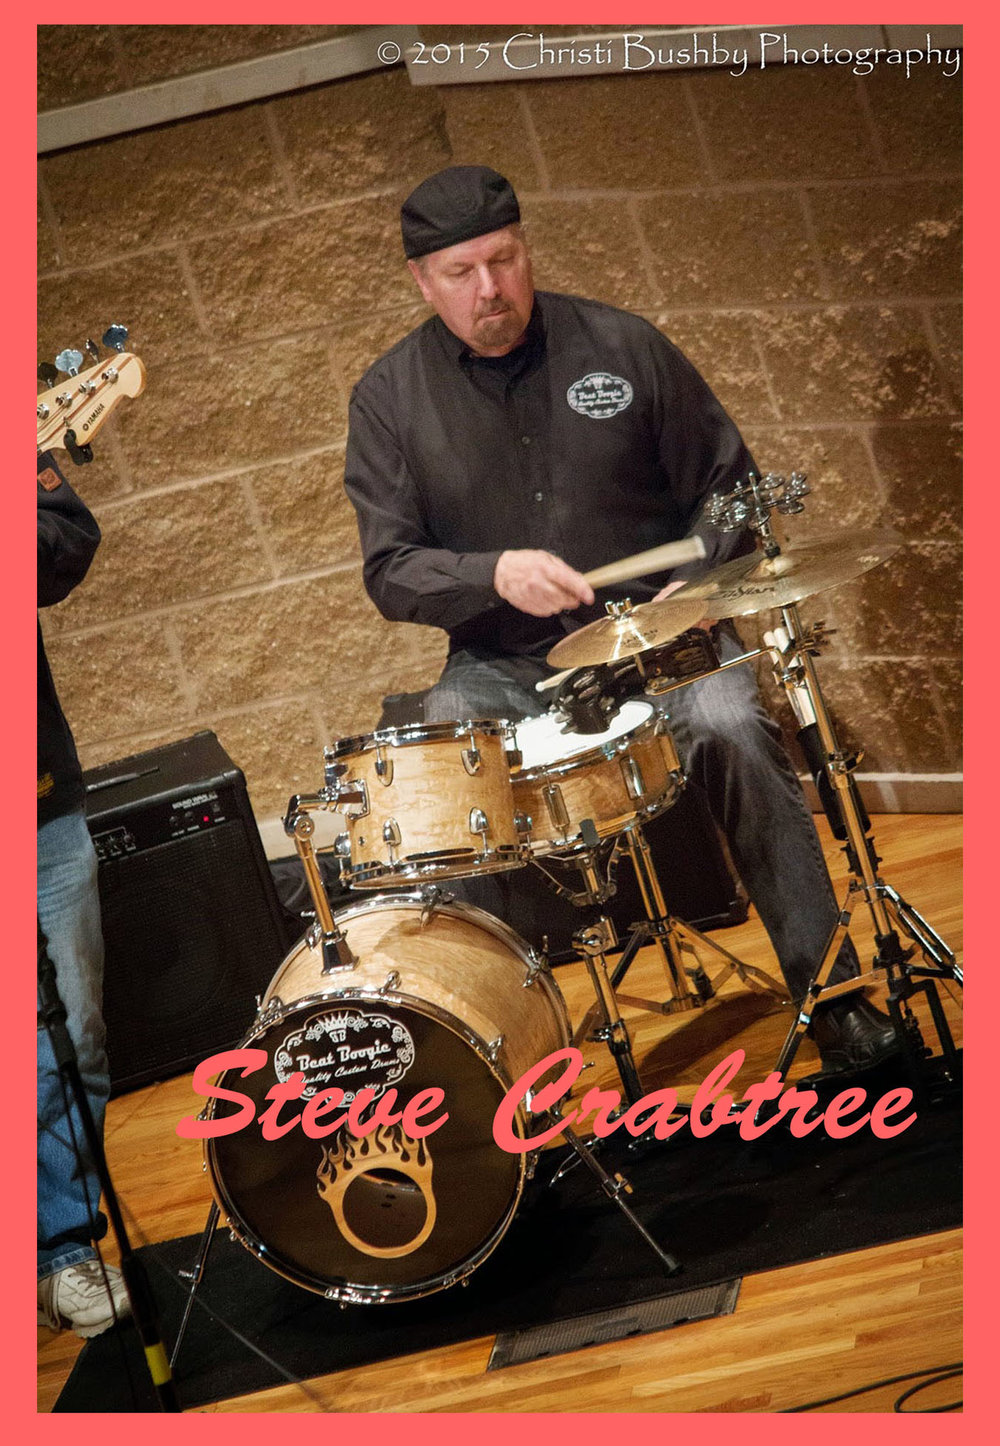 Pic-Steve-Crabtree.jpg